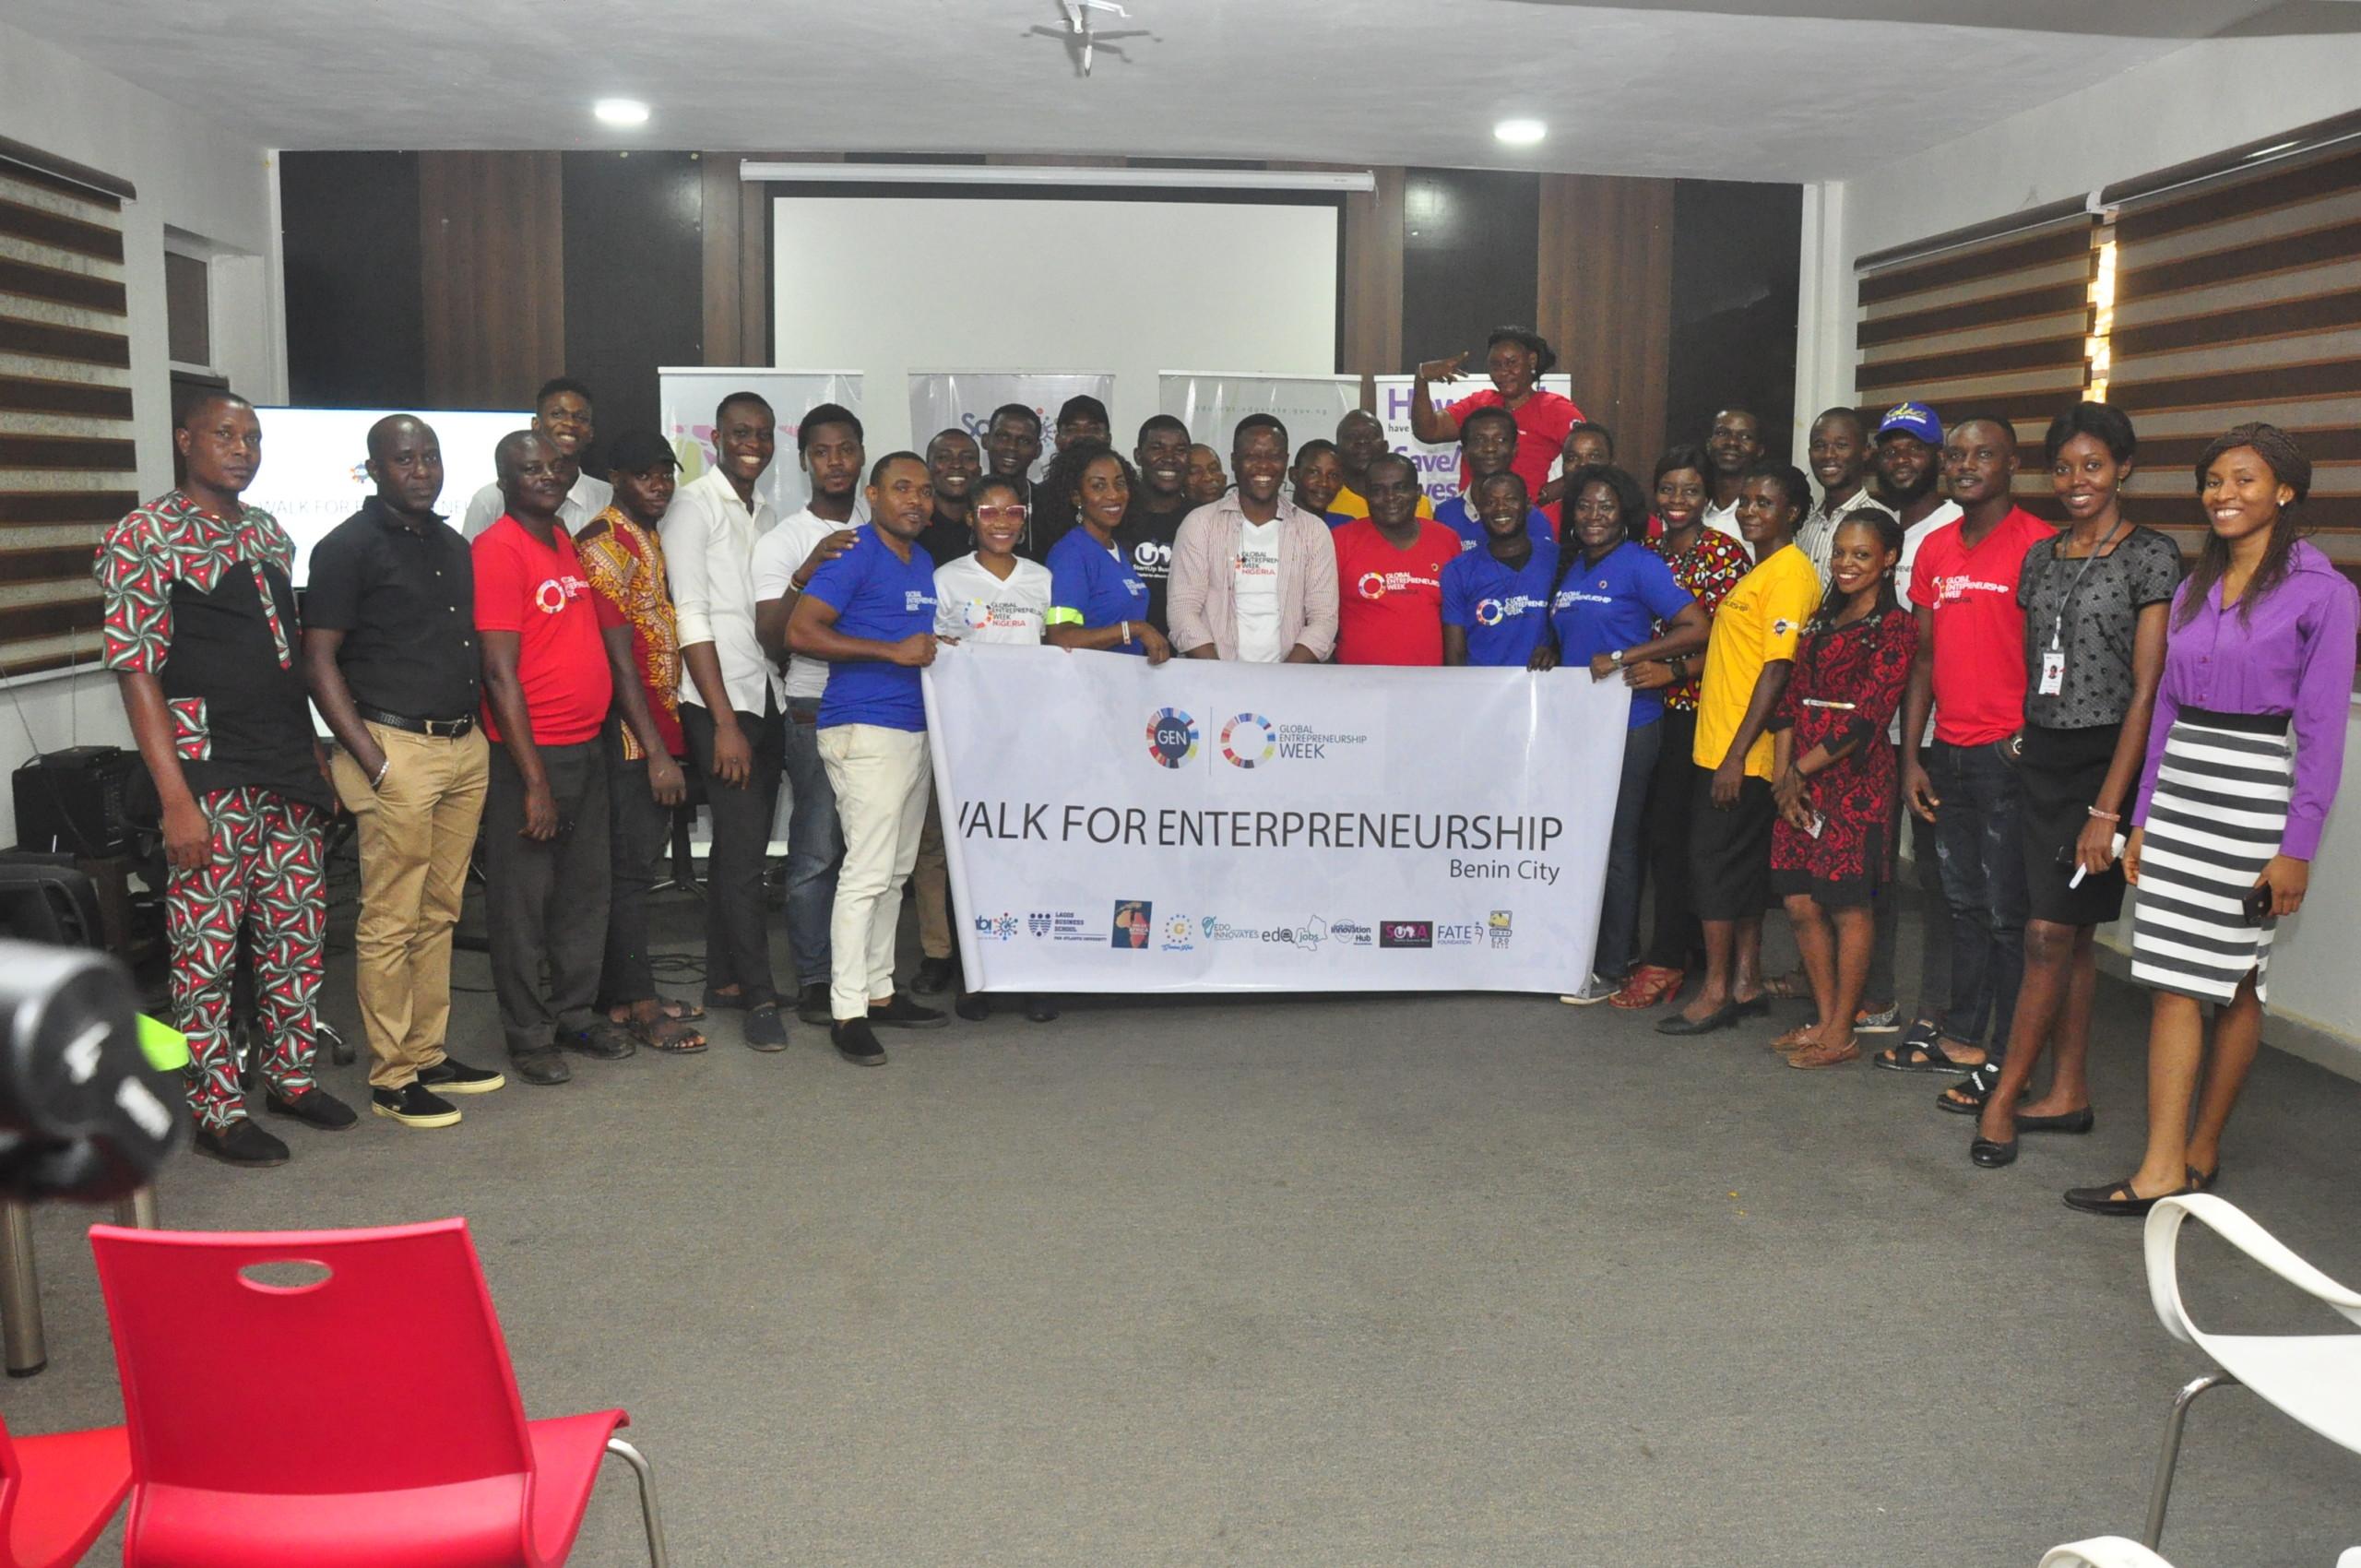 Edo, Starts-ups, Entrepreneurship